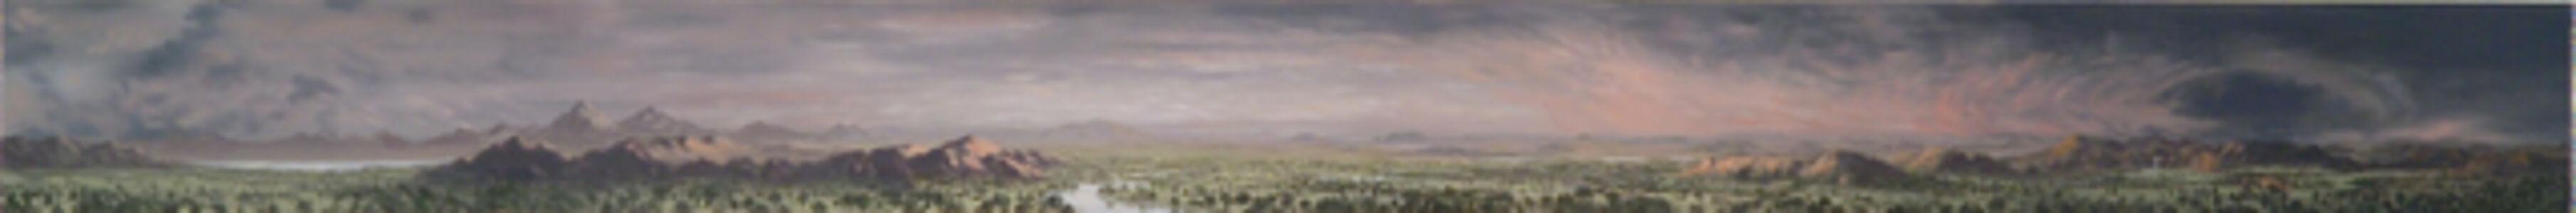 Jim Sullivan, 'Onset/Boulder Valley', 2005